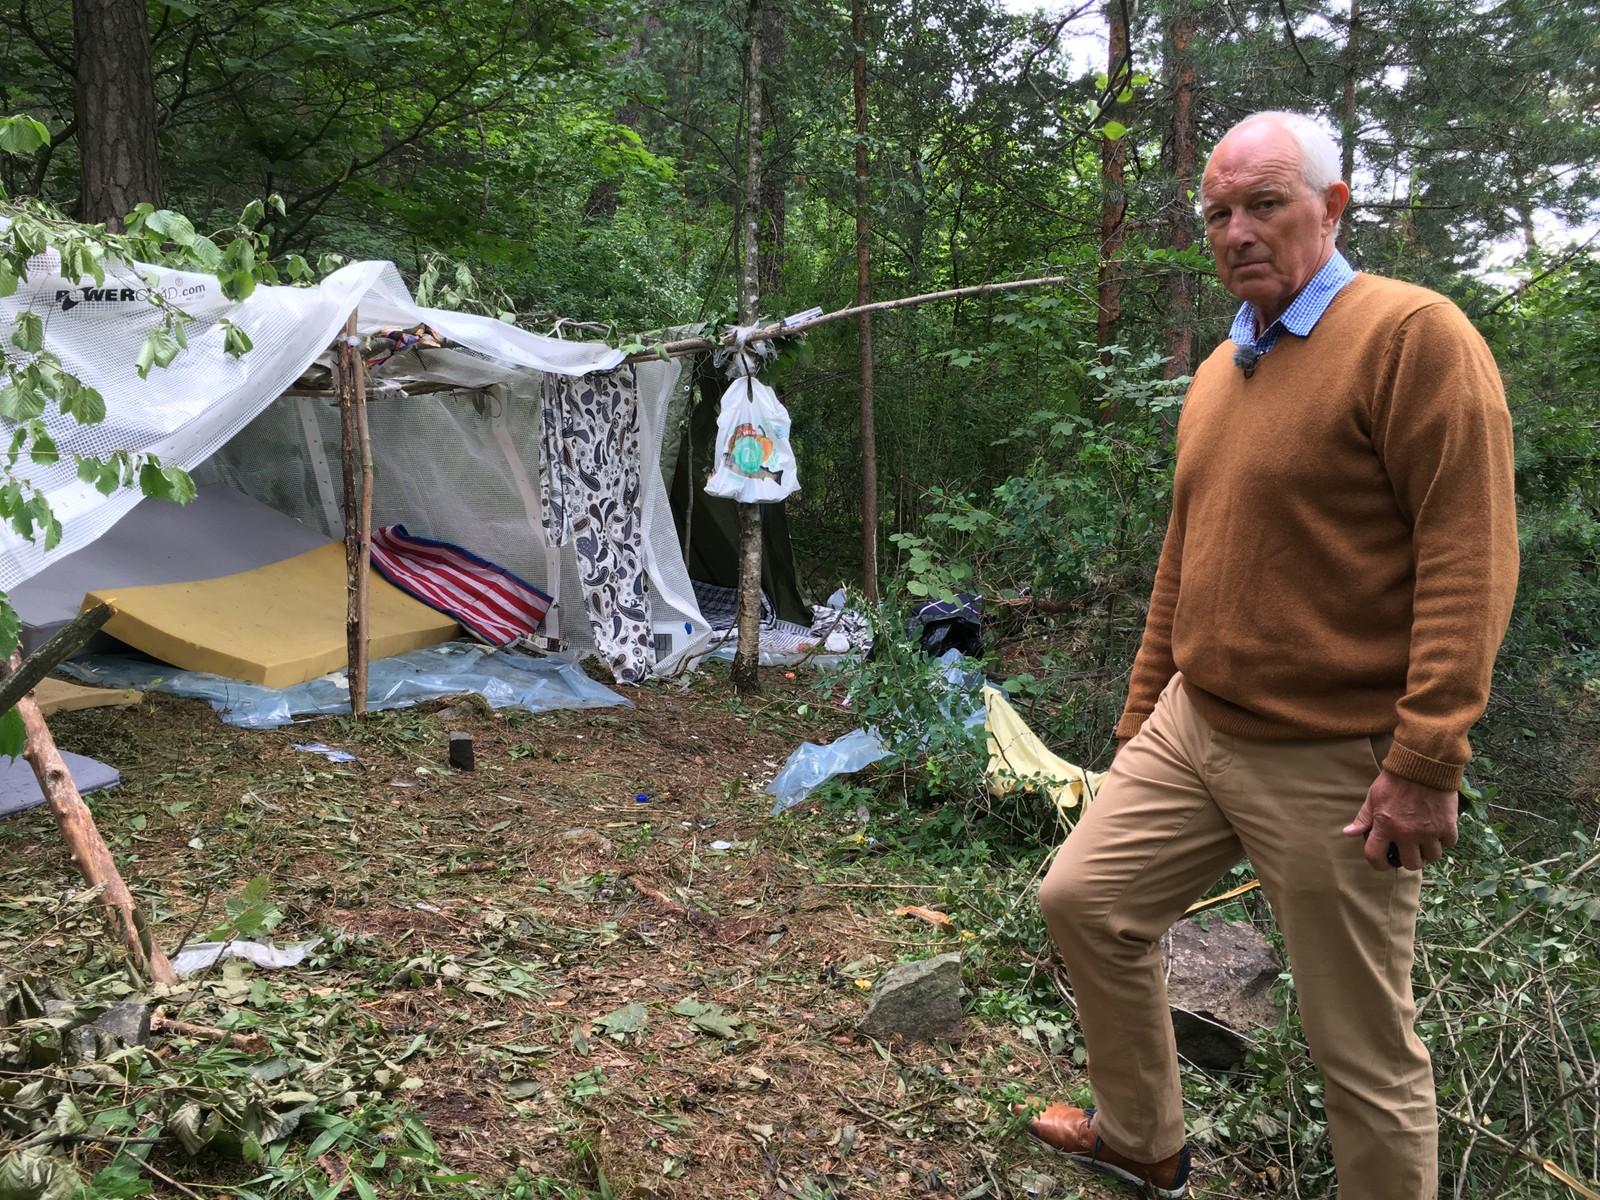 FORTVILET: Ruskengeneral Jan Hauger er frustrert over samarbeidet med politiet.